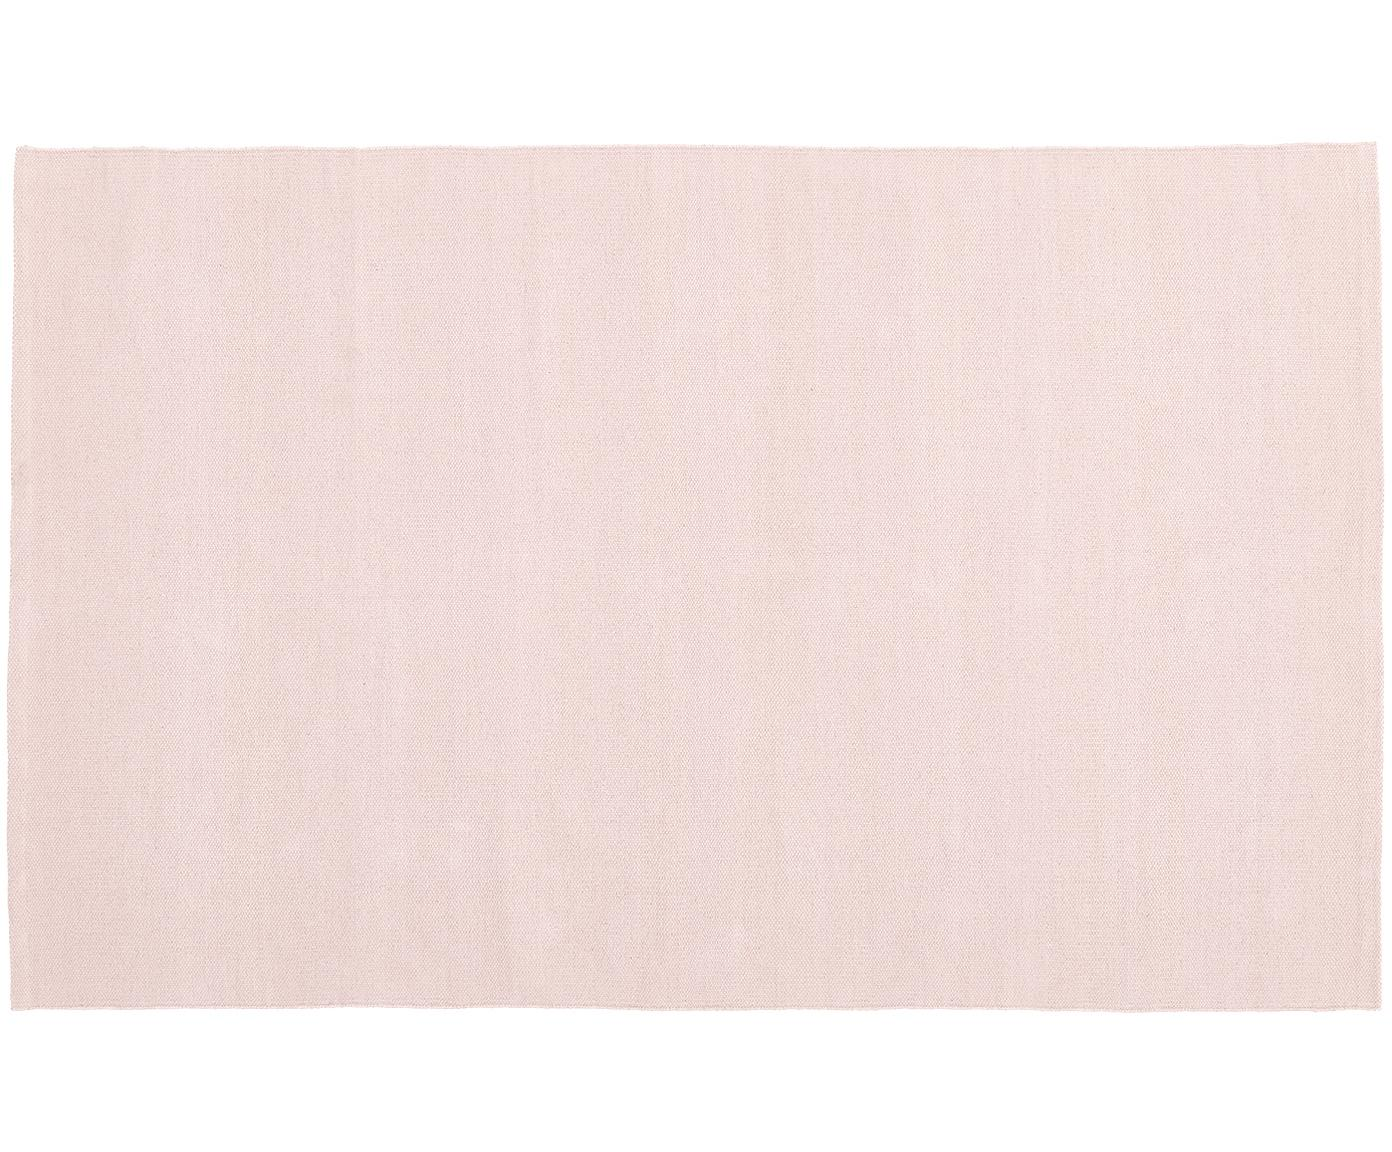 Handgeweven katoenen vloerkleed Agneta, Katoen, Roze, B 50 x L 80 cm (maat XXS)